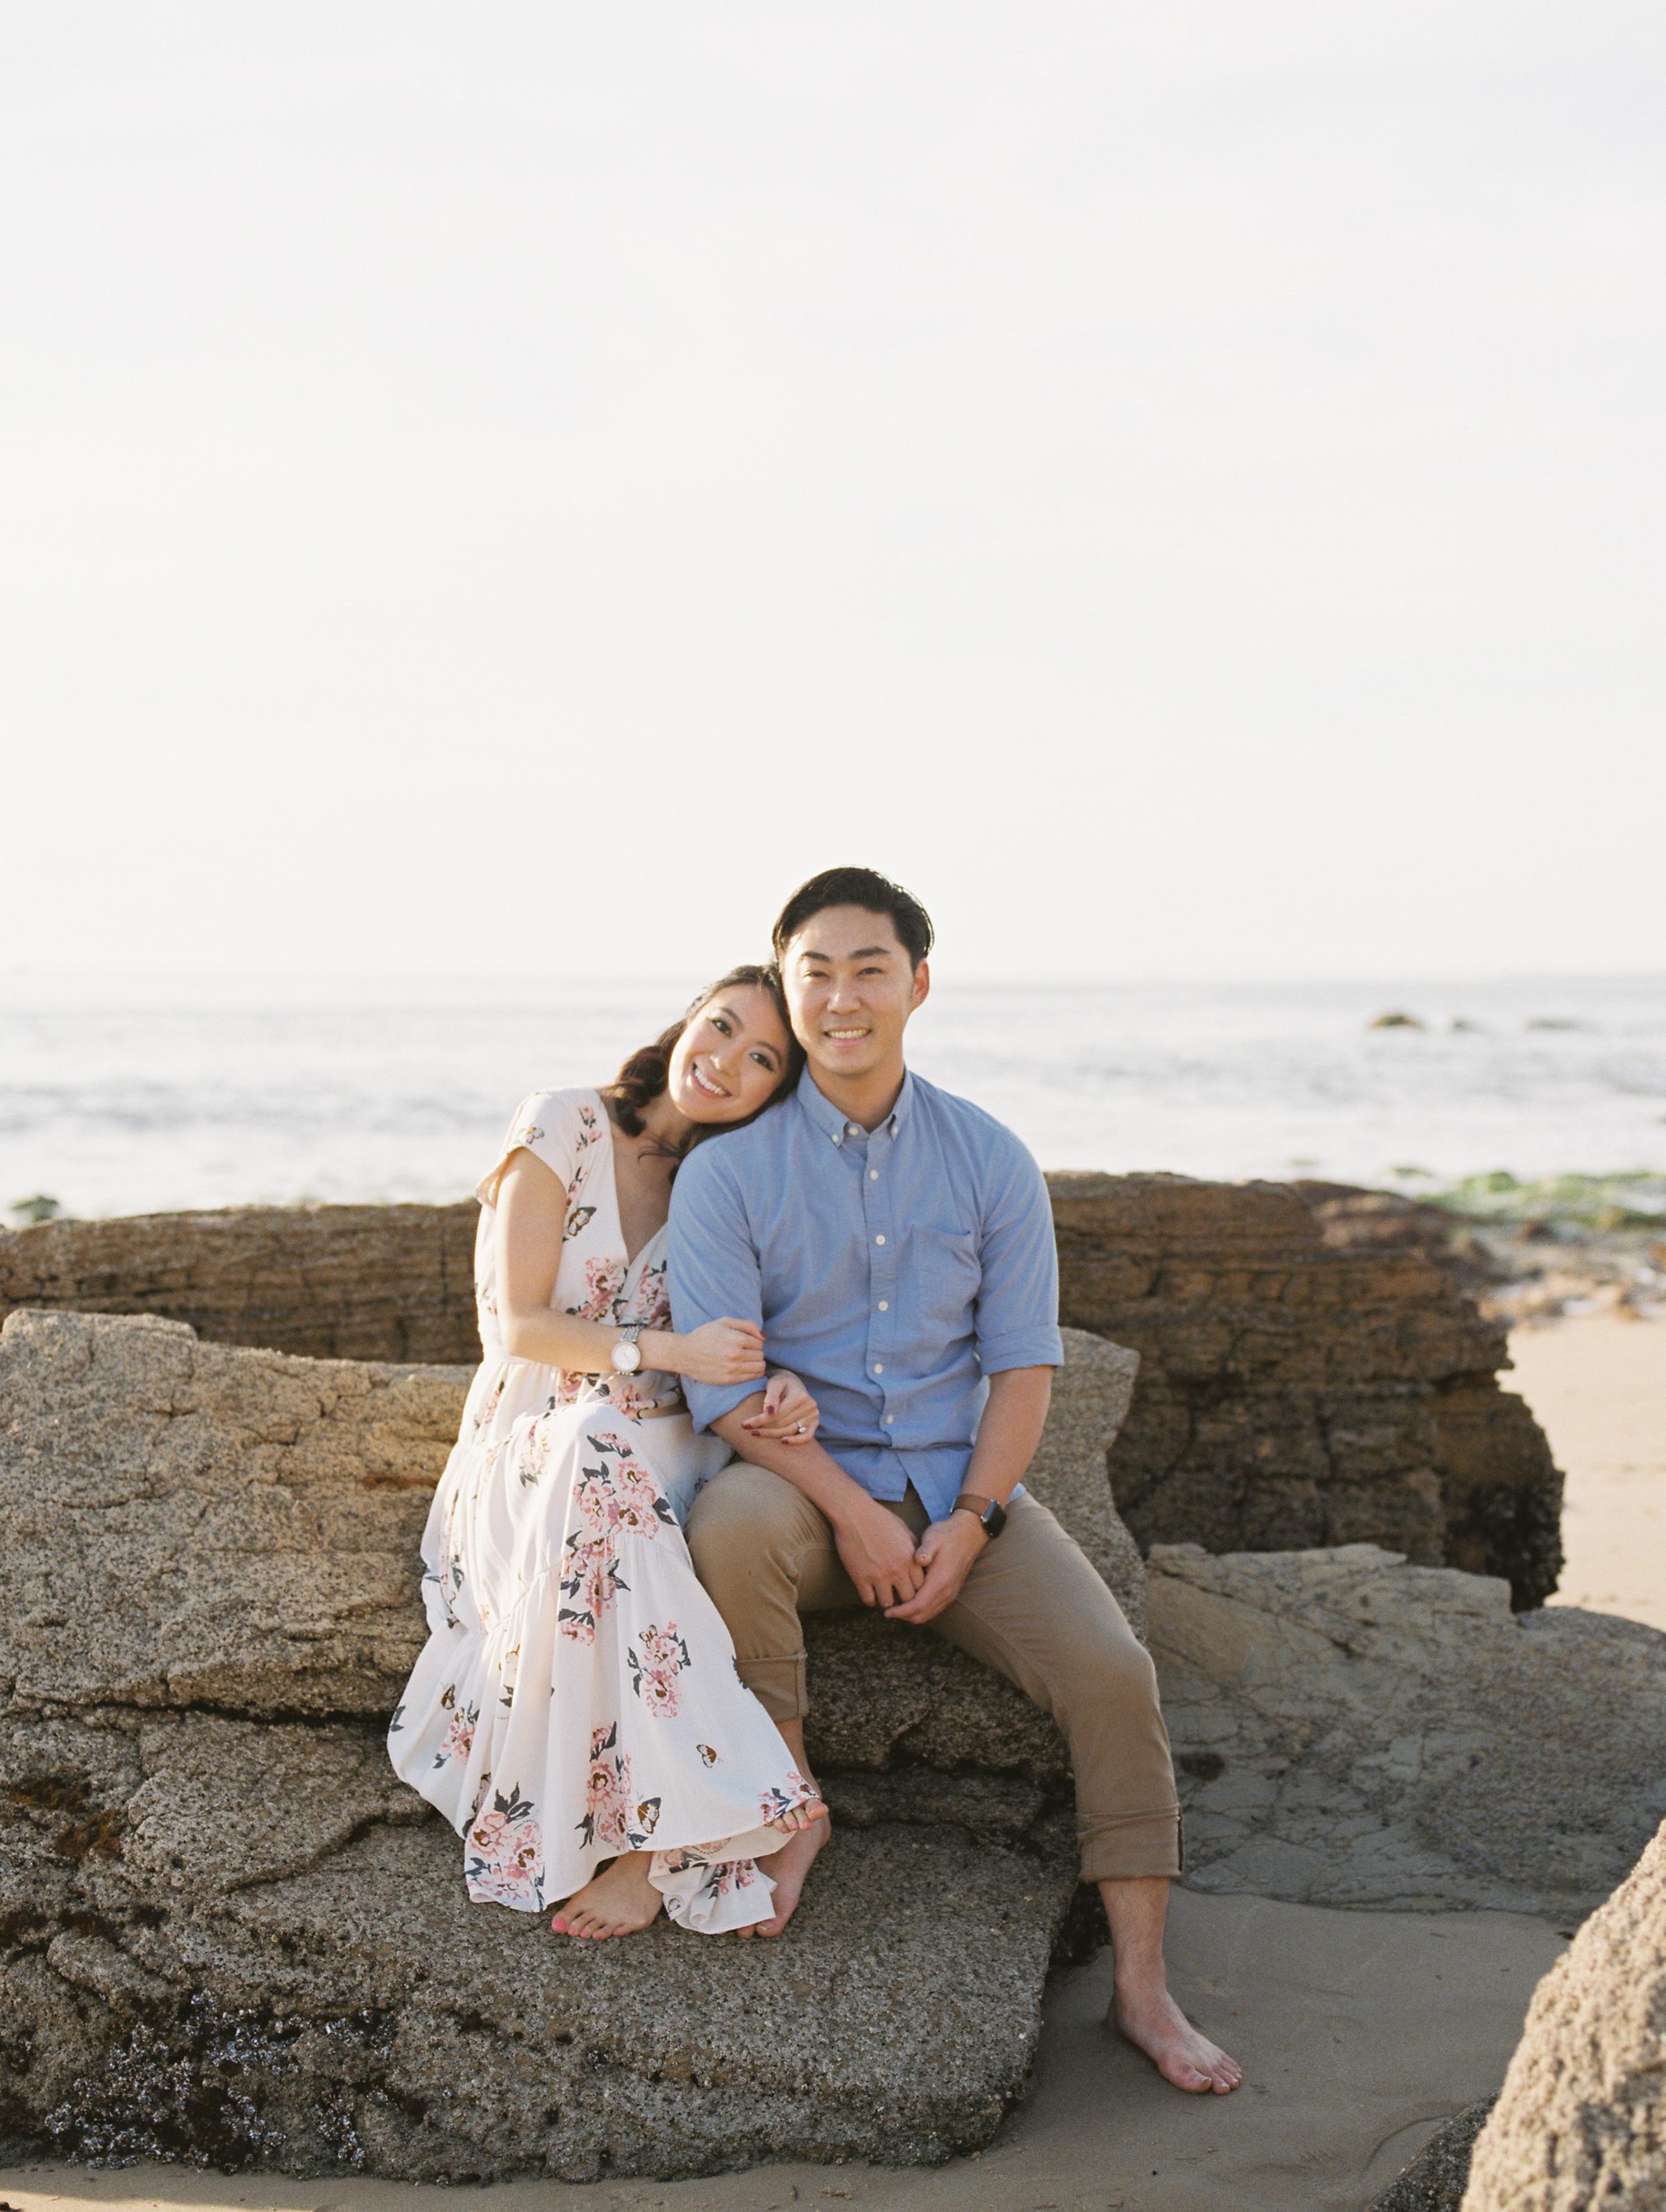 laguna-beach-orange-county-los-angeles-california-engagement-photos-pictures-026.jpg